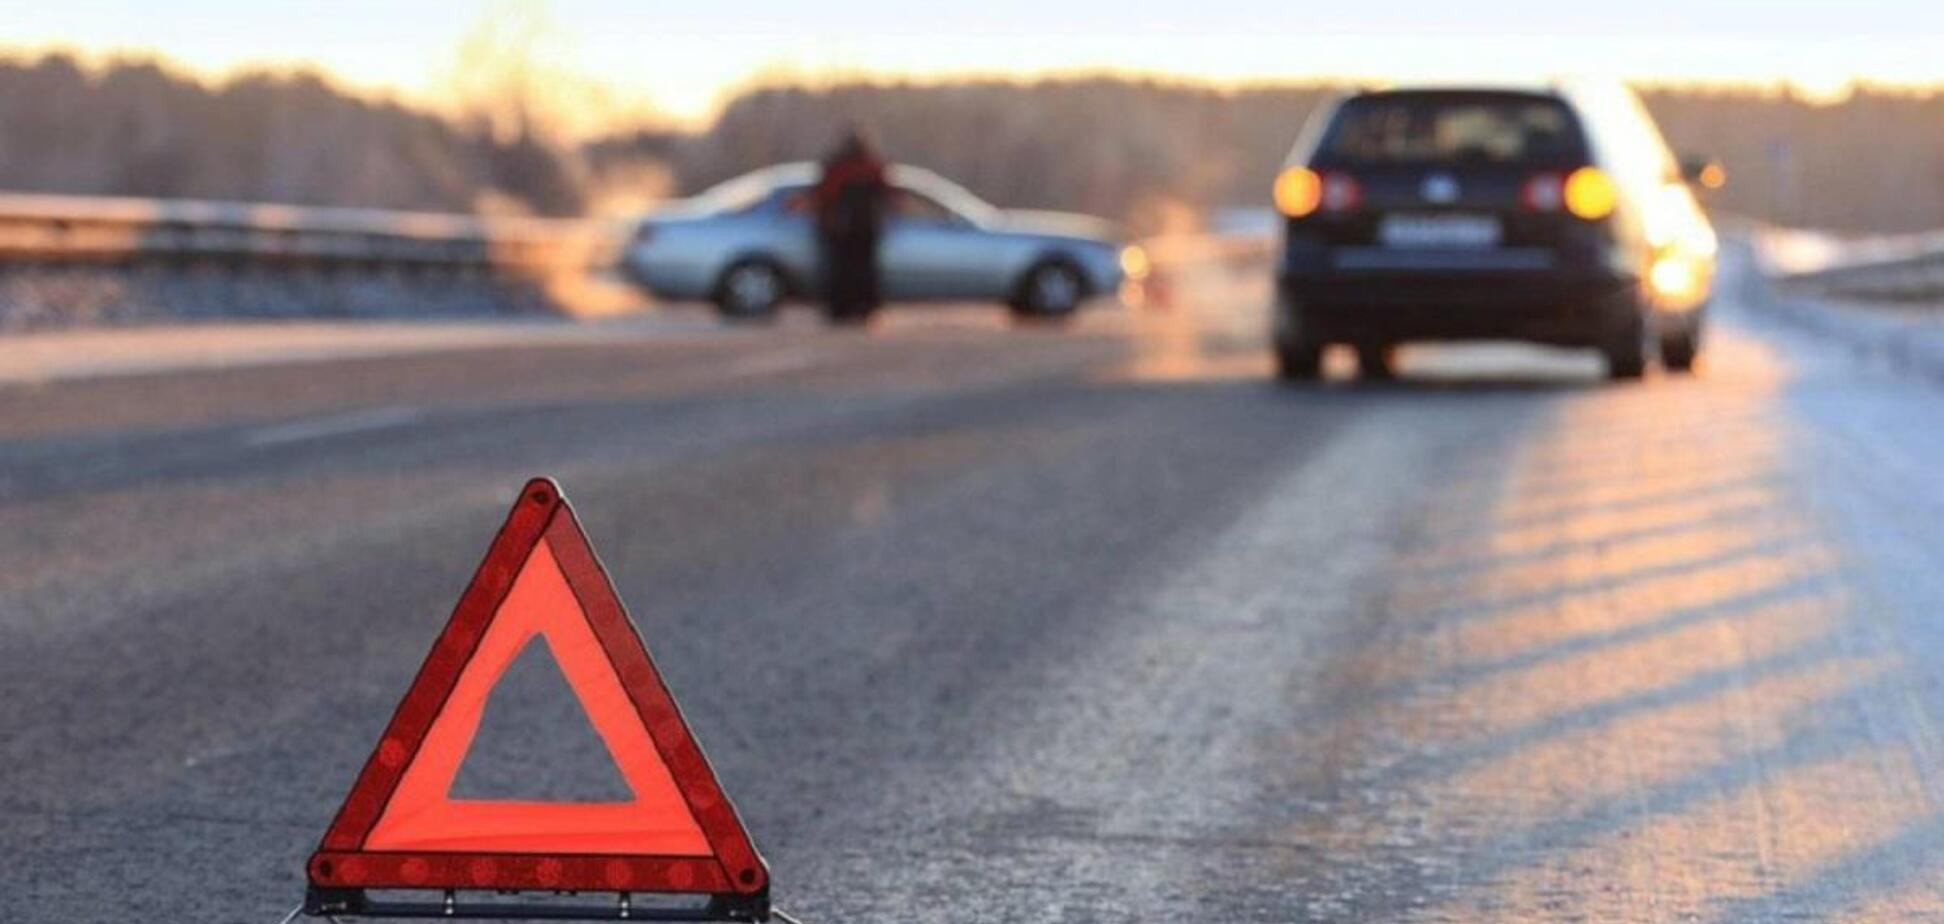 В центре Днепра маршрутка с пассажирами врезалась в джип: момент попал на видео